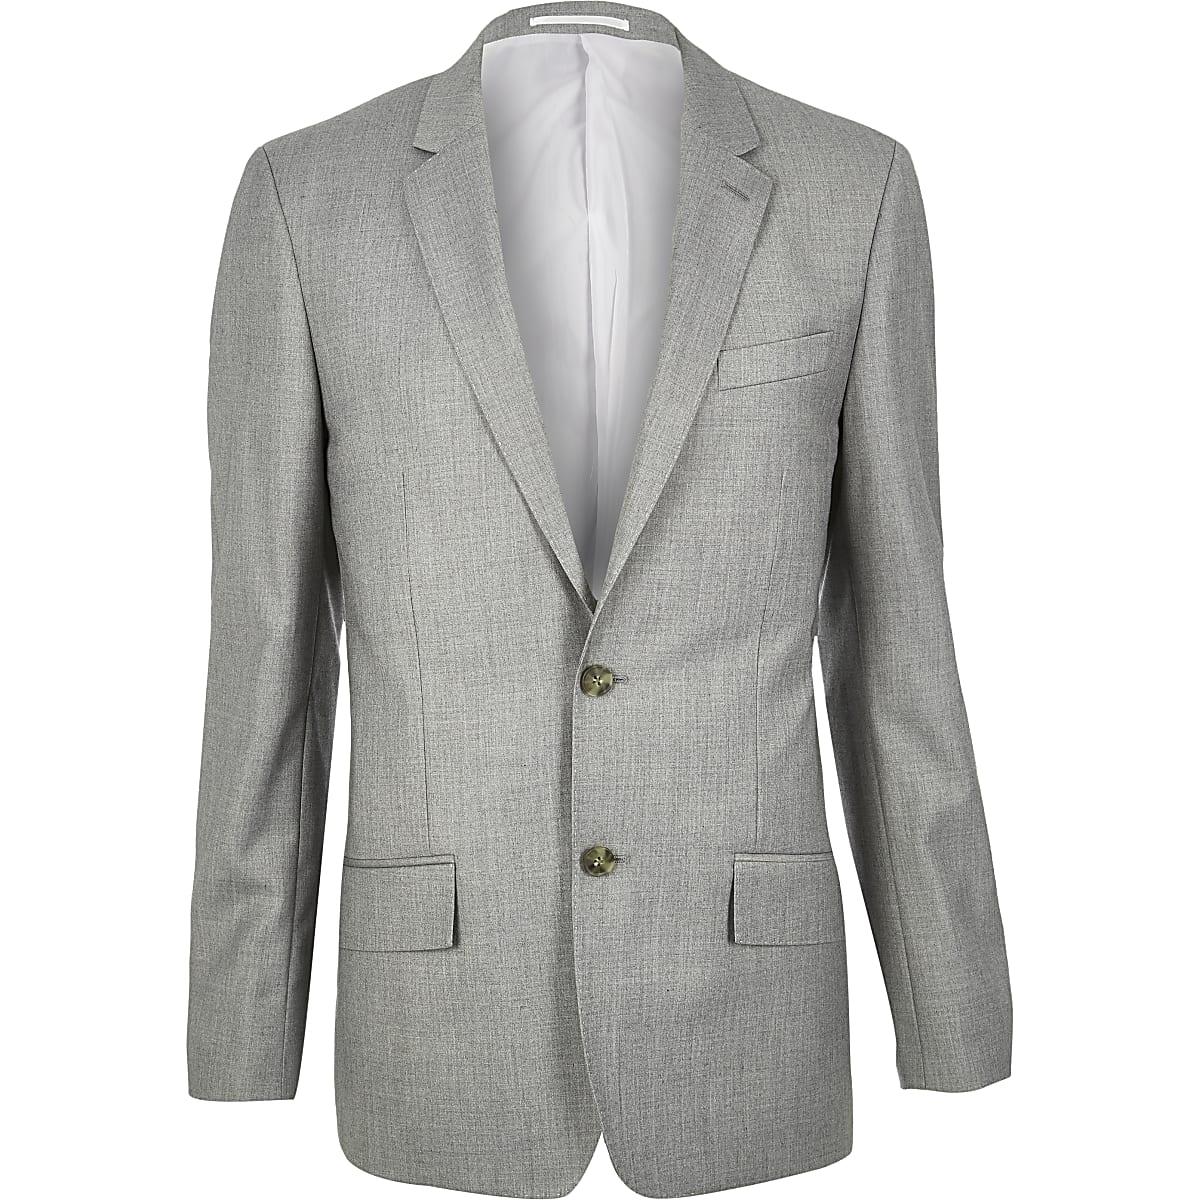 Grey slim suit jackets